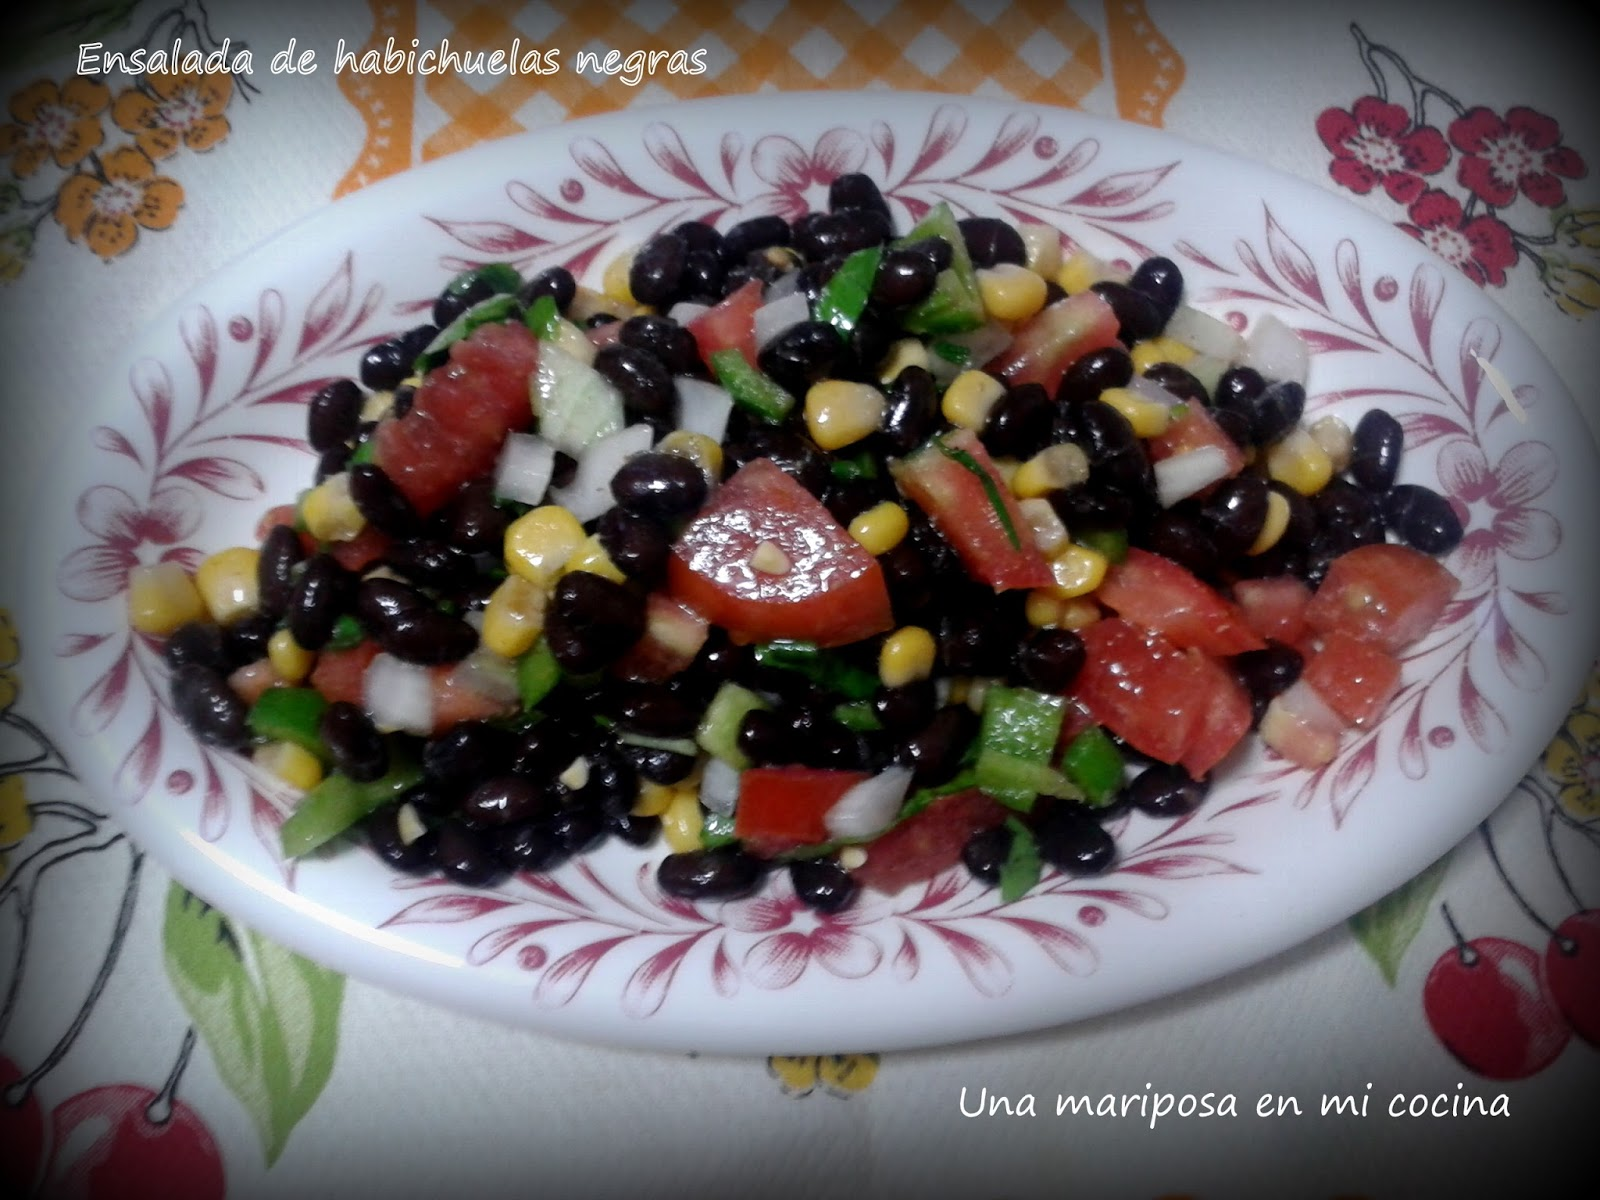 Ensalada de alubias negras recetas de cocina - Ensalada de alubias ...